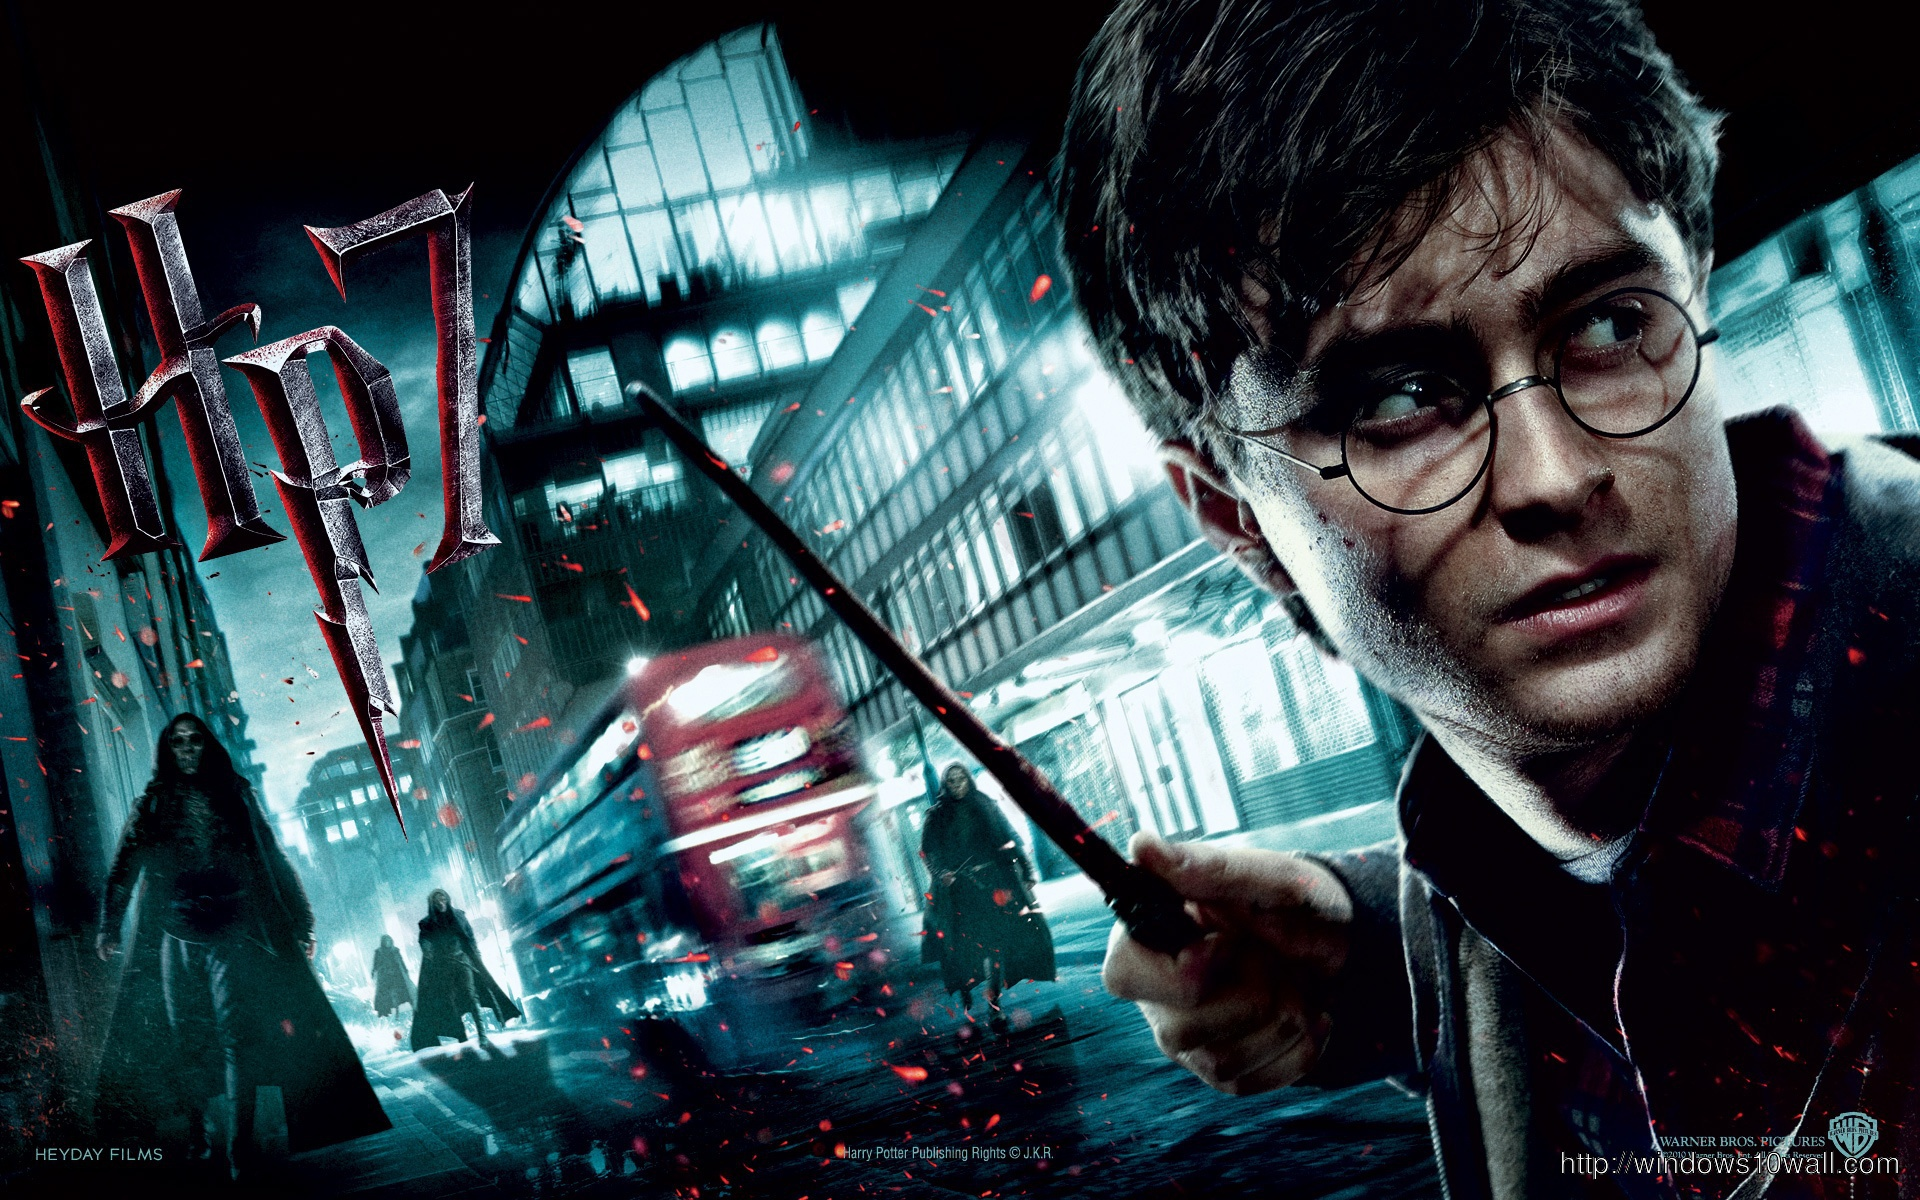 Harry potter 7 deathly hd download wallpaper windows 10 - Harry potter images download ...